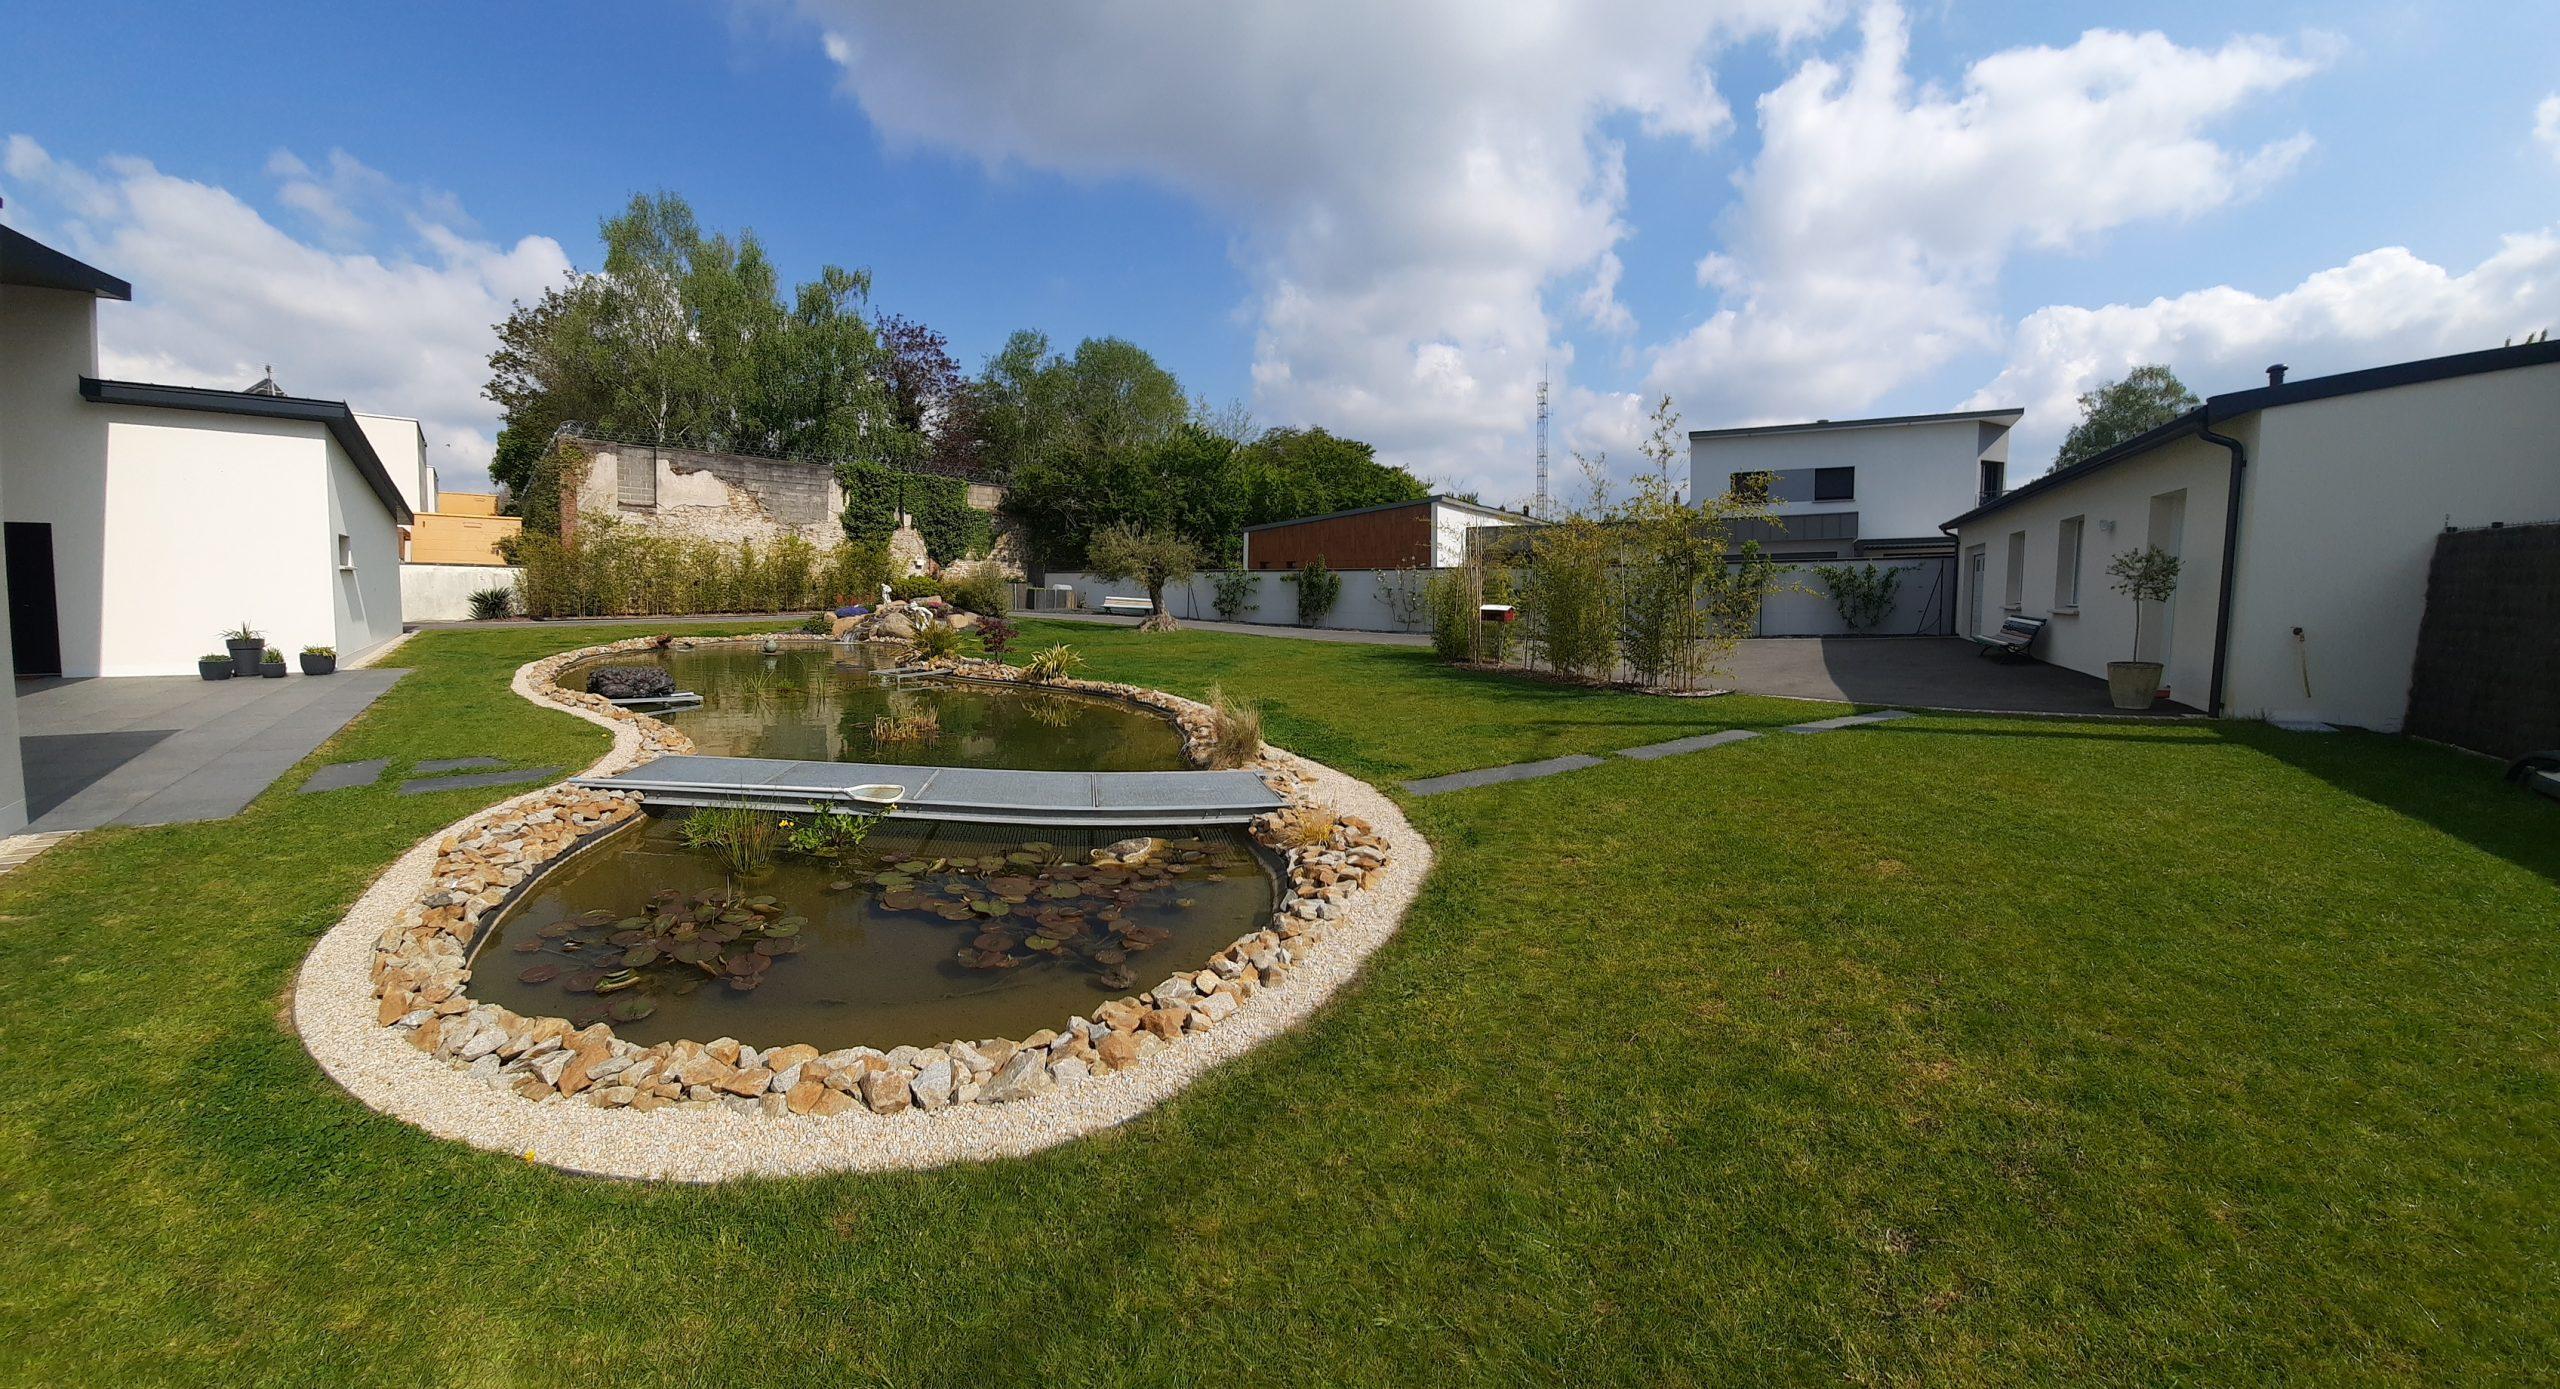 bassin, cascade, jardinier paysagiste brochard paysage, mayenne